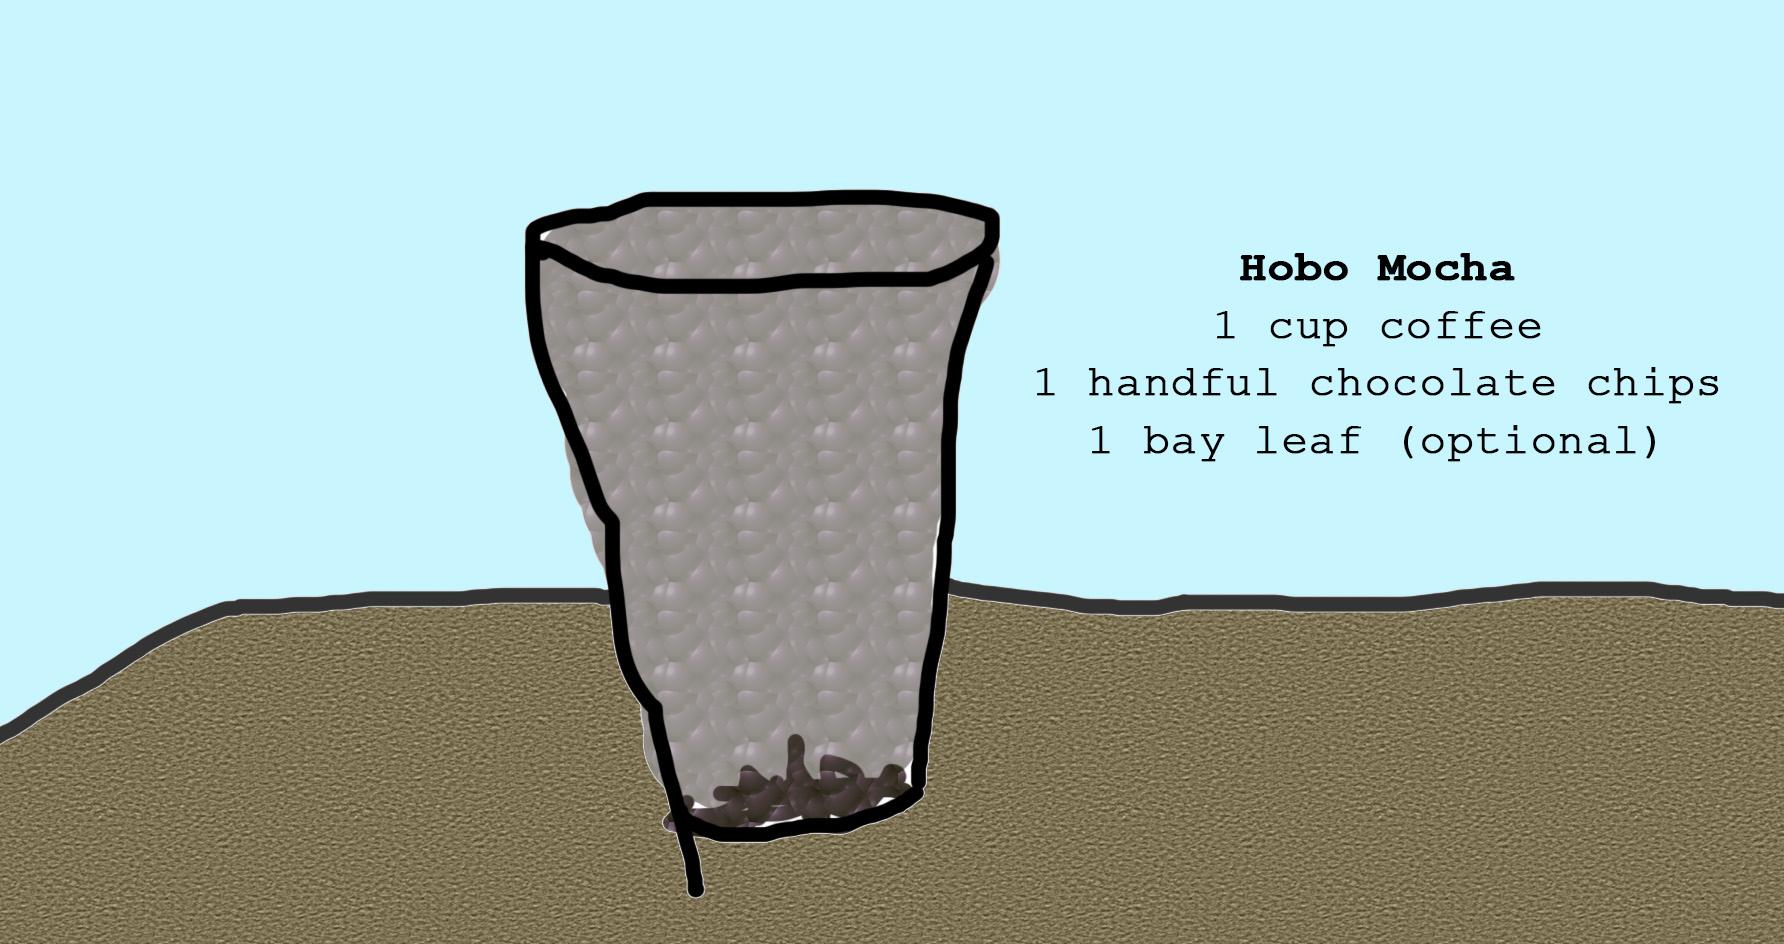 Bay leaf? Just because every legitimate recipe has a bay leaf, I guess